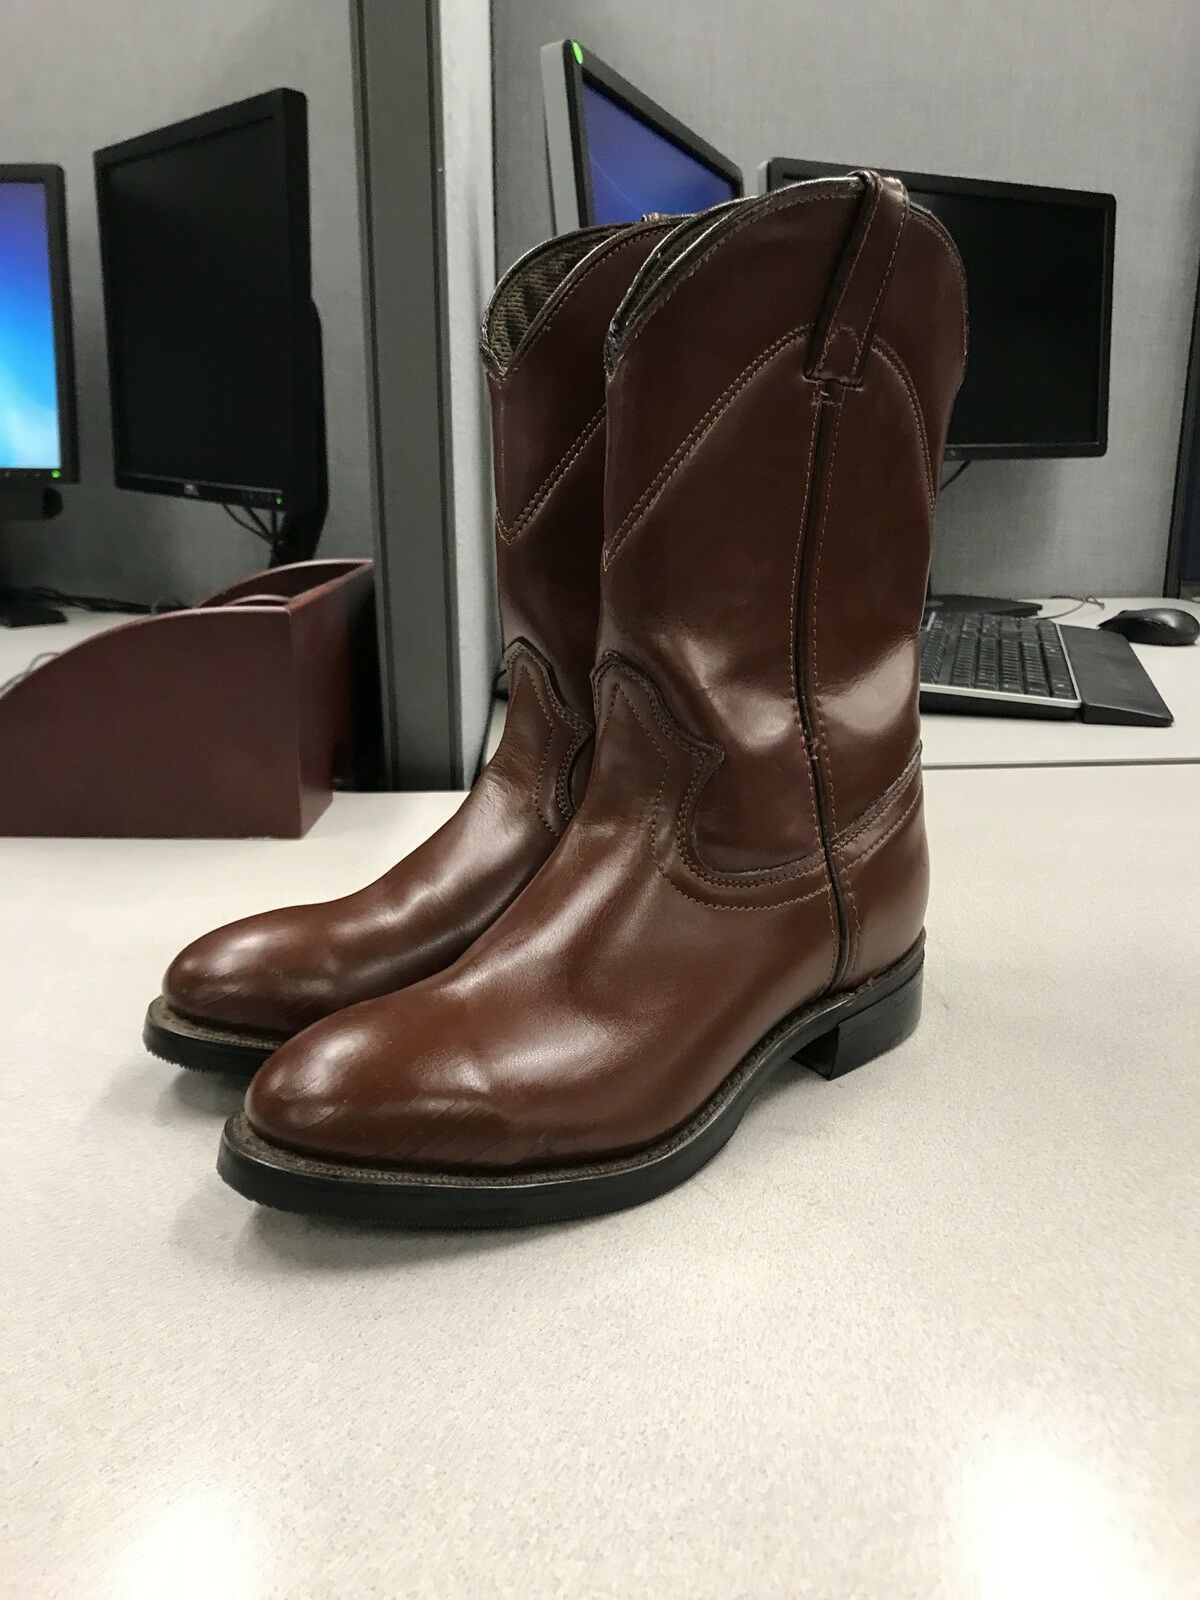 Lehigh homme en cuir marron démarrage Steel Cap Toe taille 7D